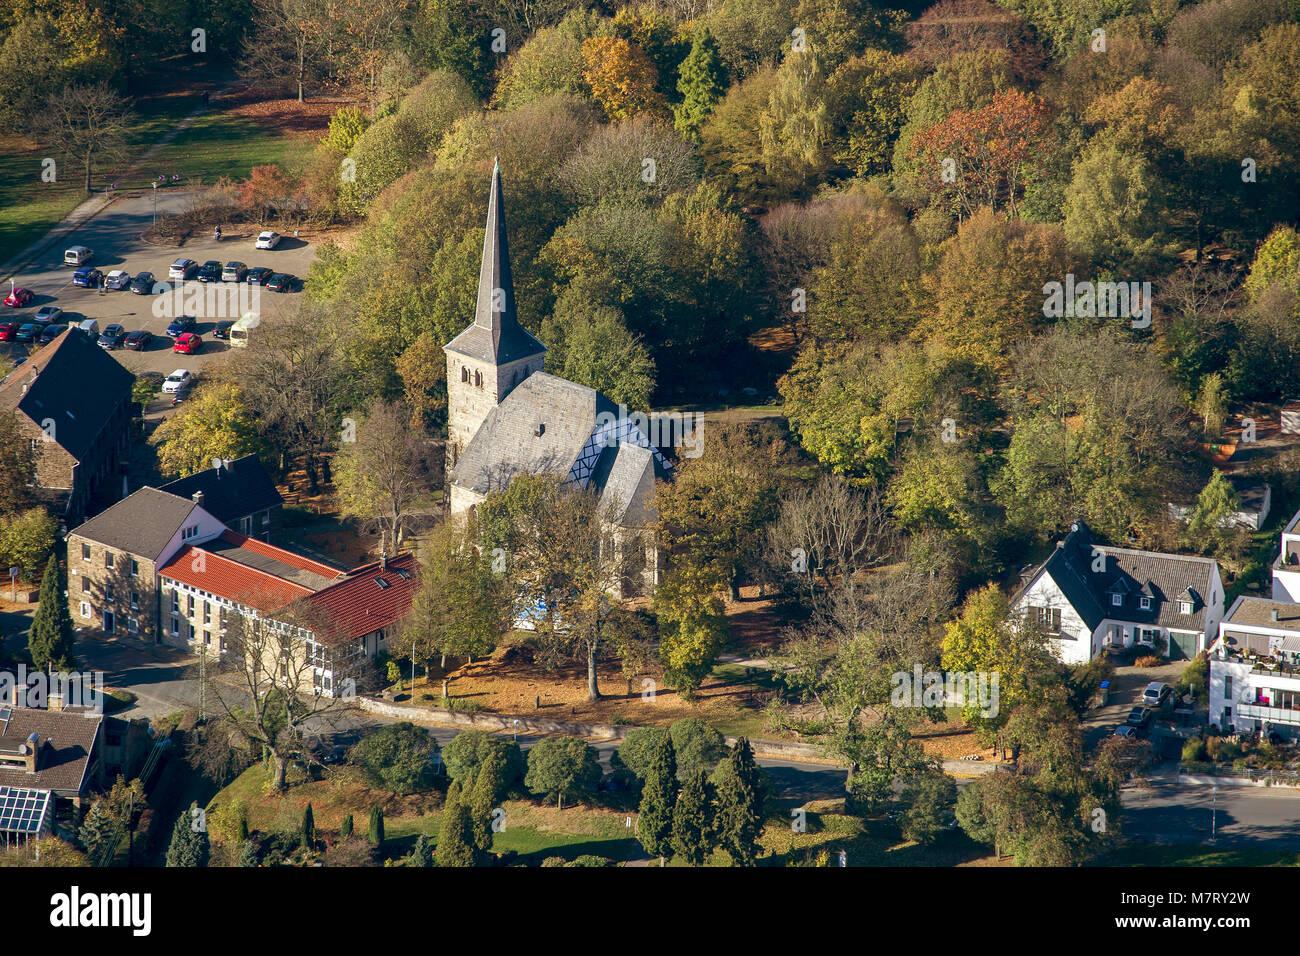 Aerial view, Stiepeler village church, Stiepeler village church, Bochum, Ruhr area, North Rhine-Westphalia, Germany, Europe, birds-eyes view, aerial v Stock Photo